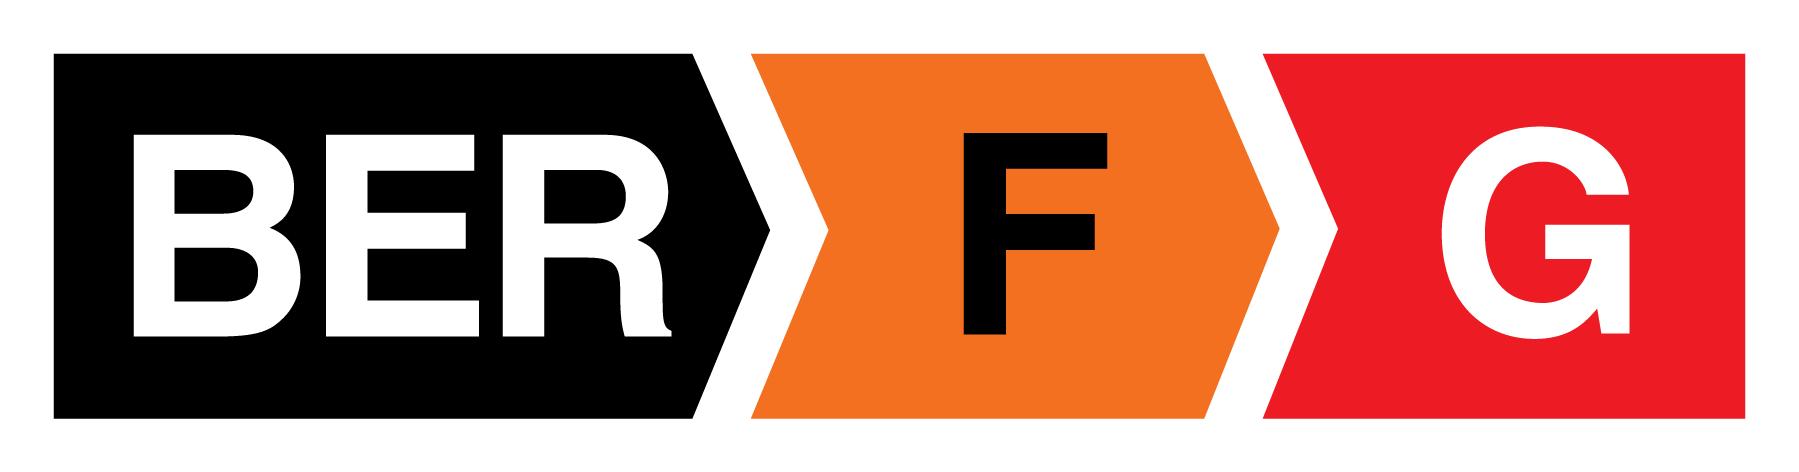 BER: BER: F > G